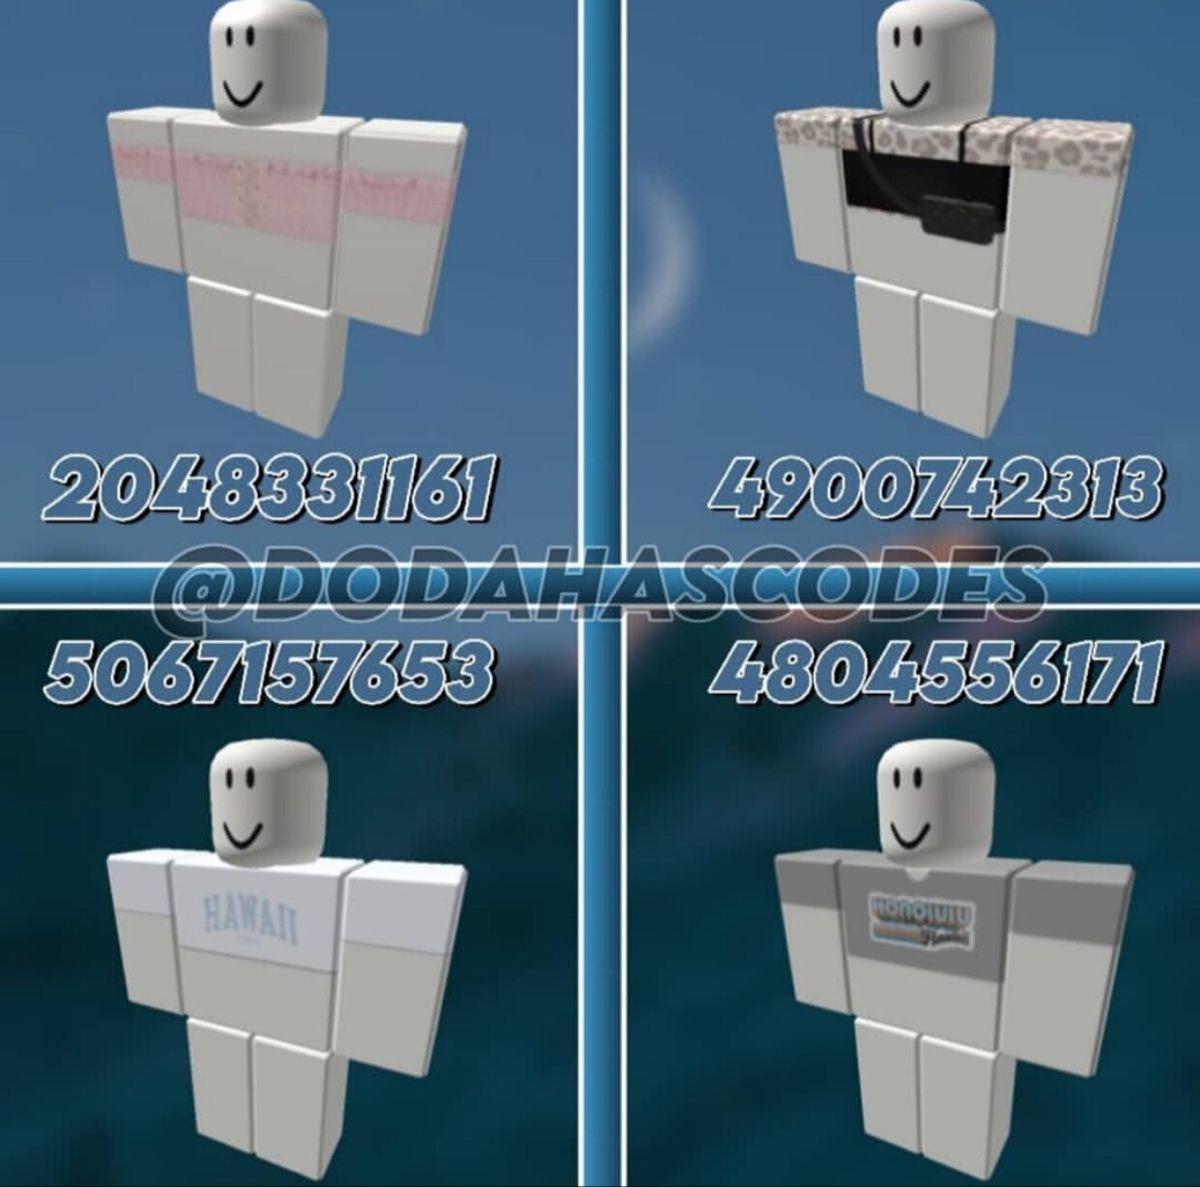 Roblox Bloxburg Codes Roblox Roblox Shirt Coding [ 1187 x 1200 Pixel ]